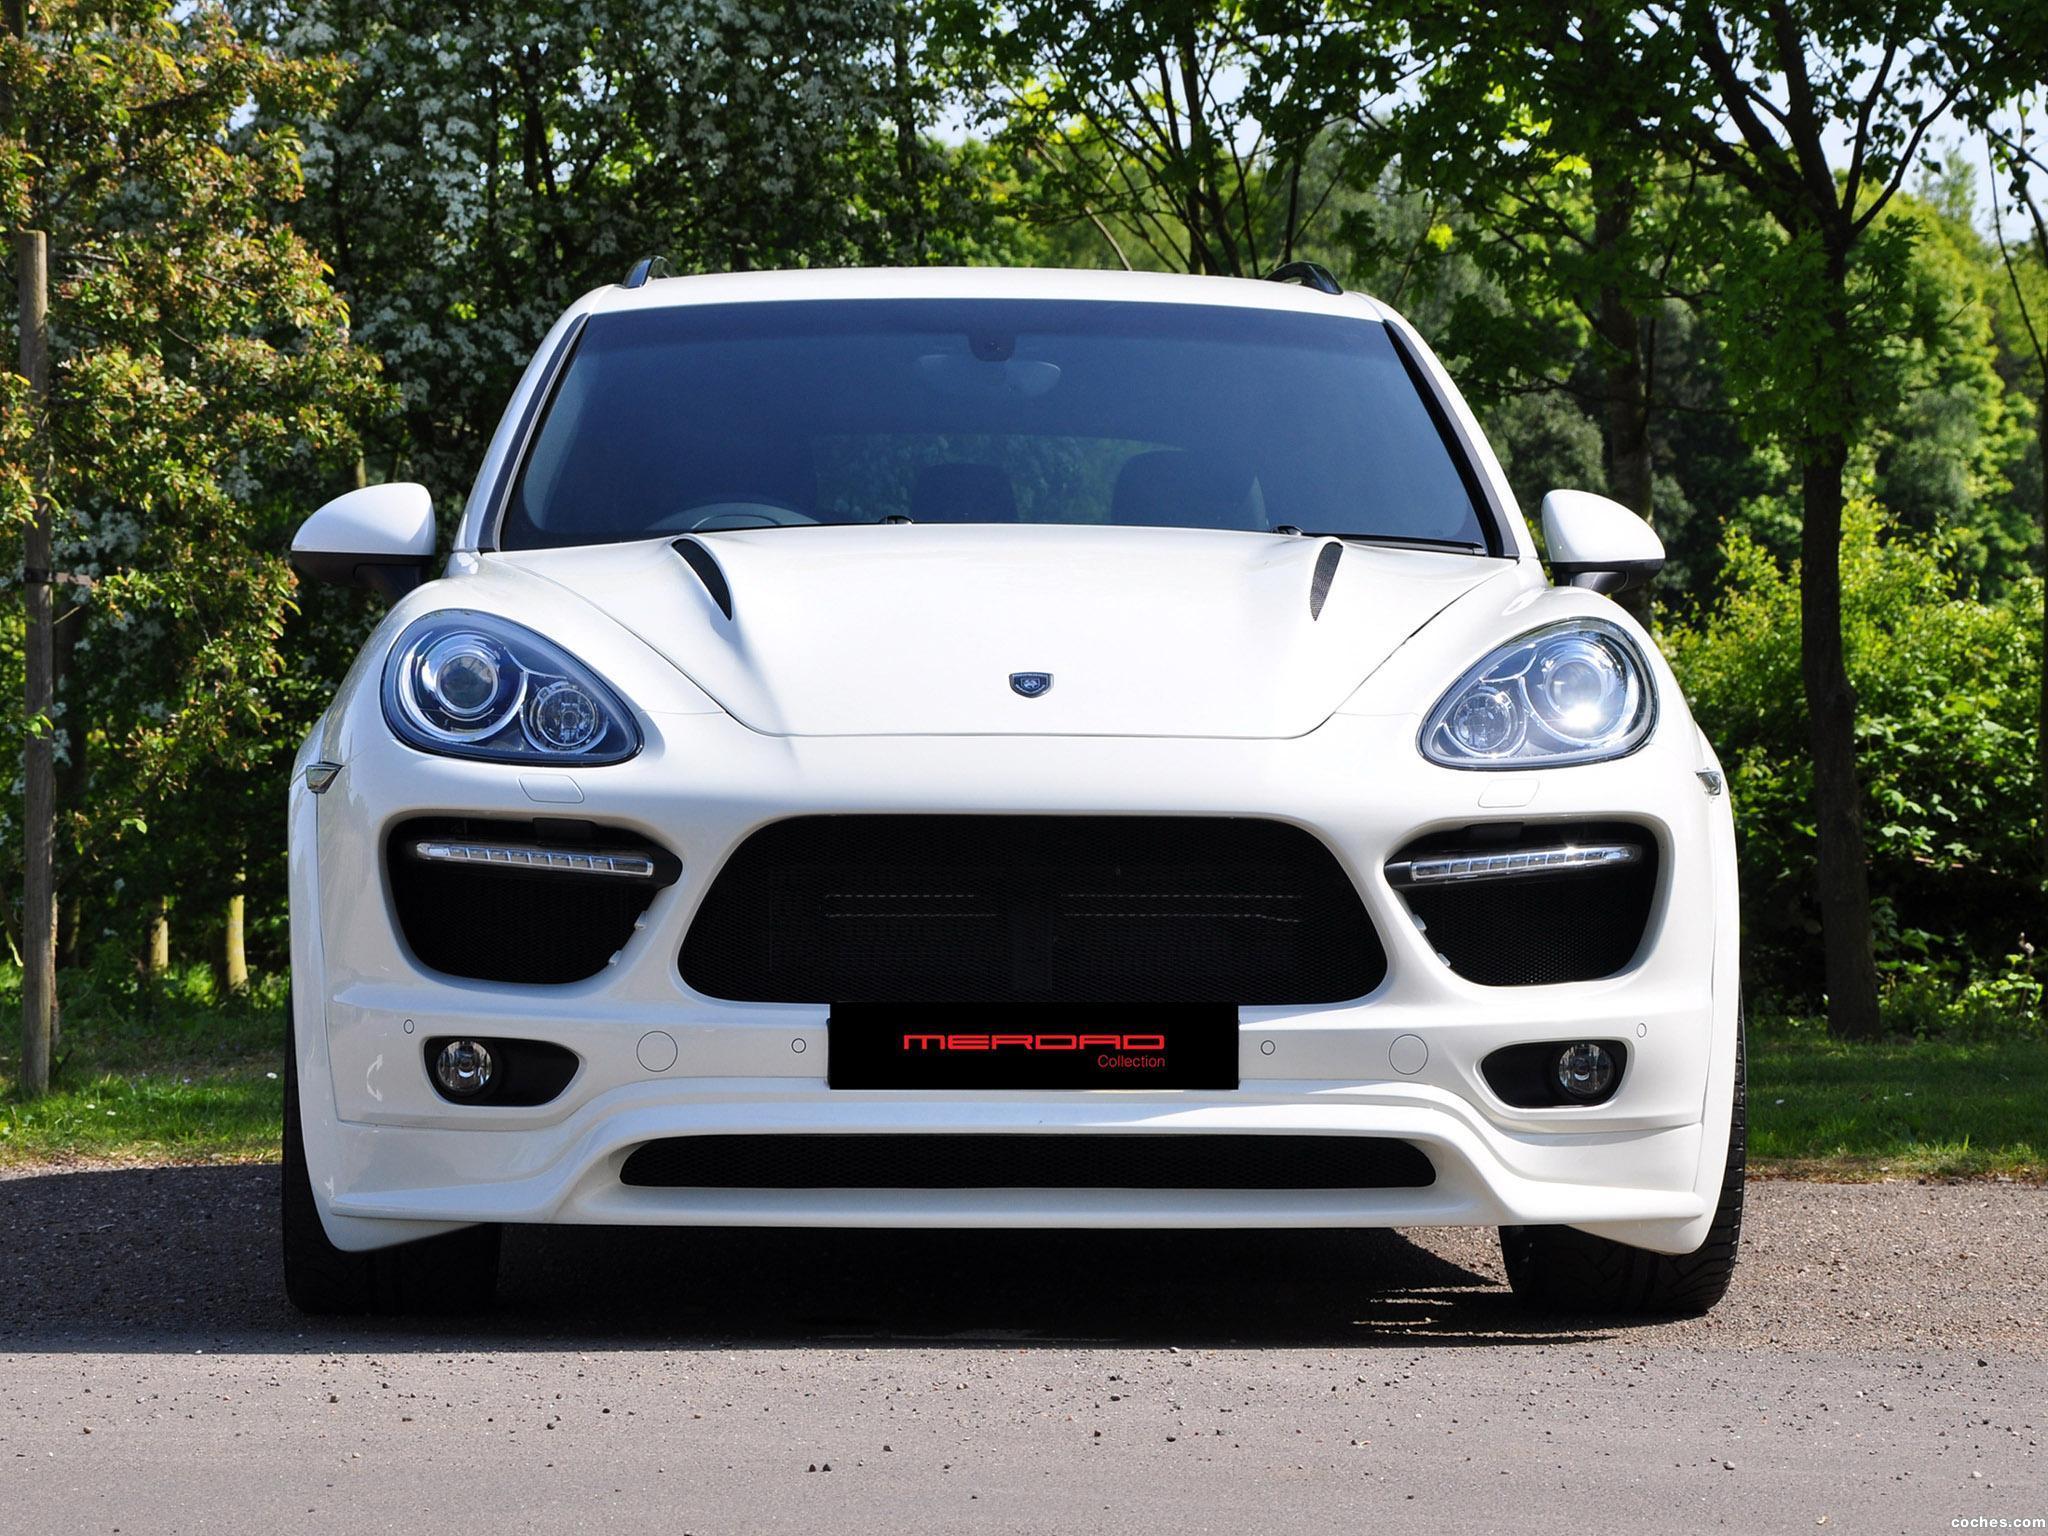 Foto 5 de Merdad Porsche Cayenne 958 2011